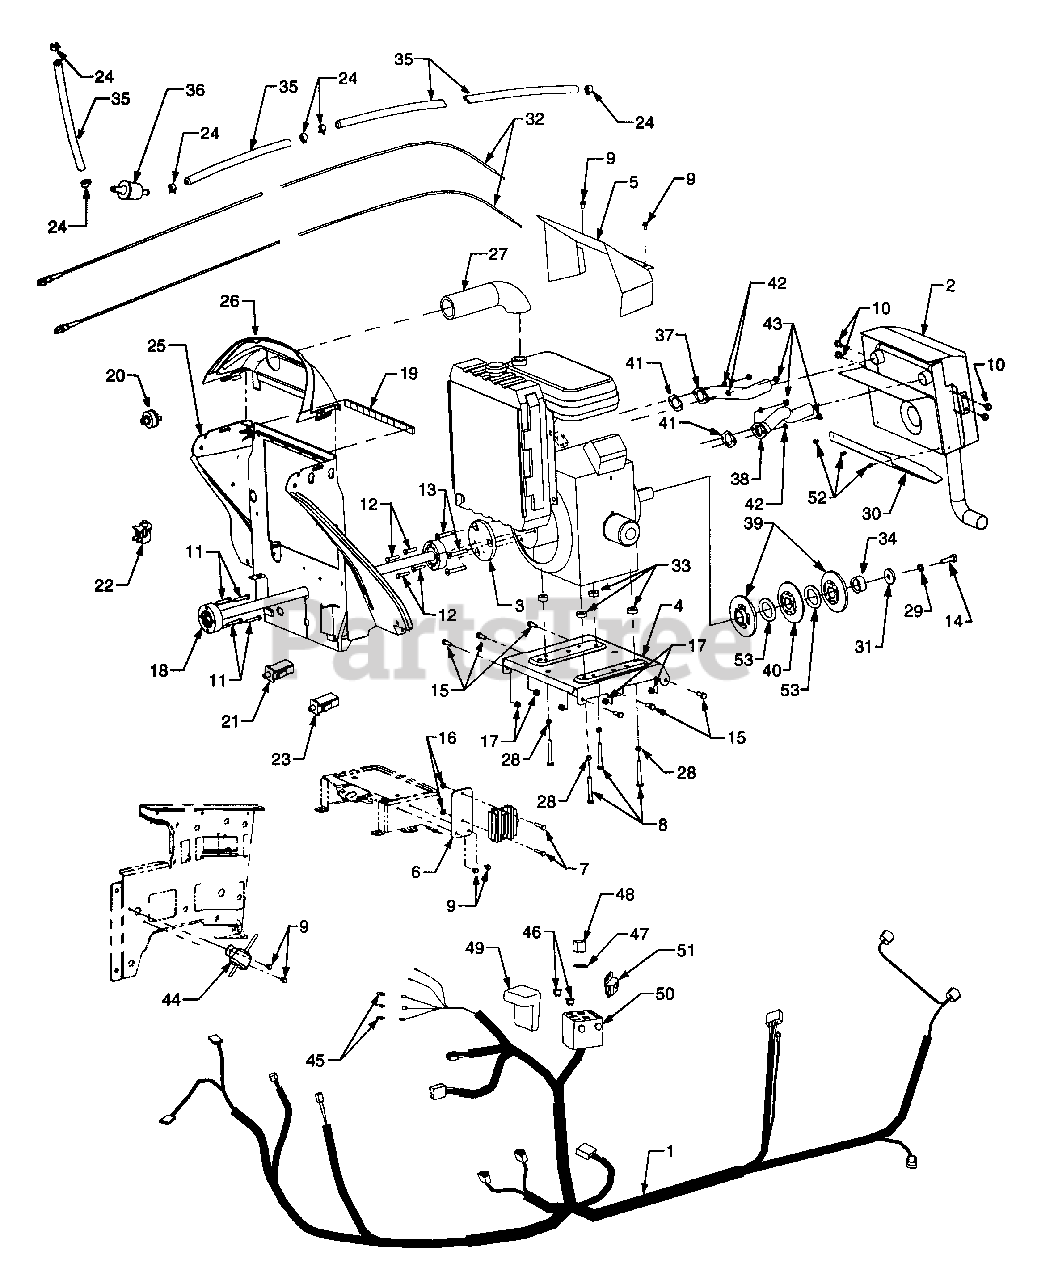 Garmin 3205 Wiring Diagram